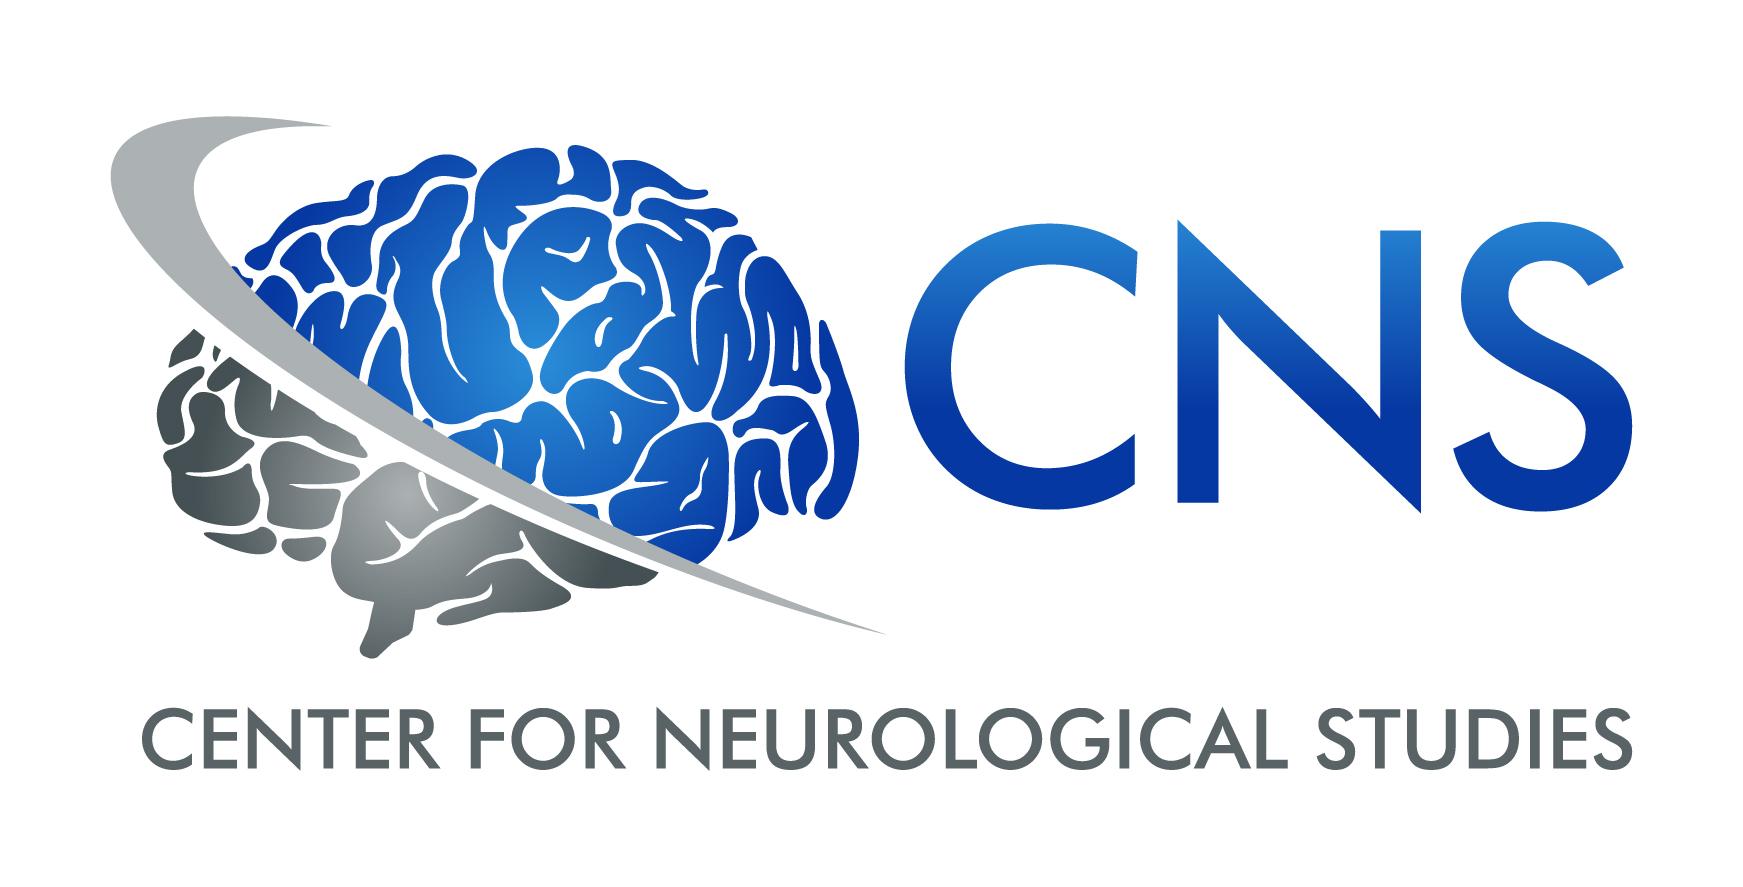 PB Neurological Center | Specialized Neurologists